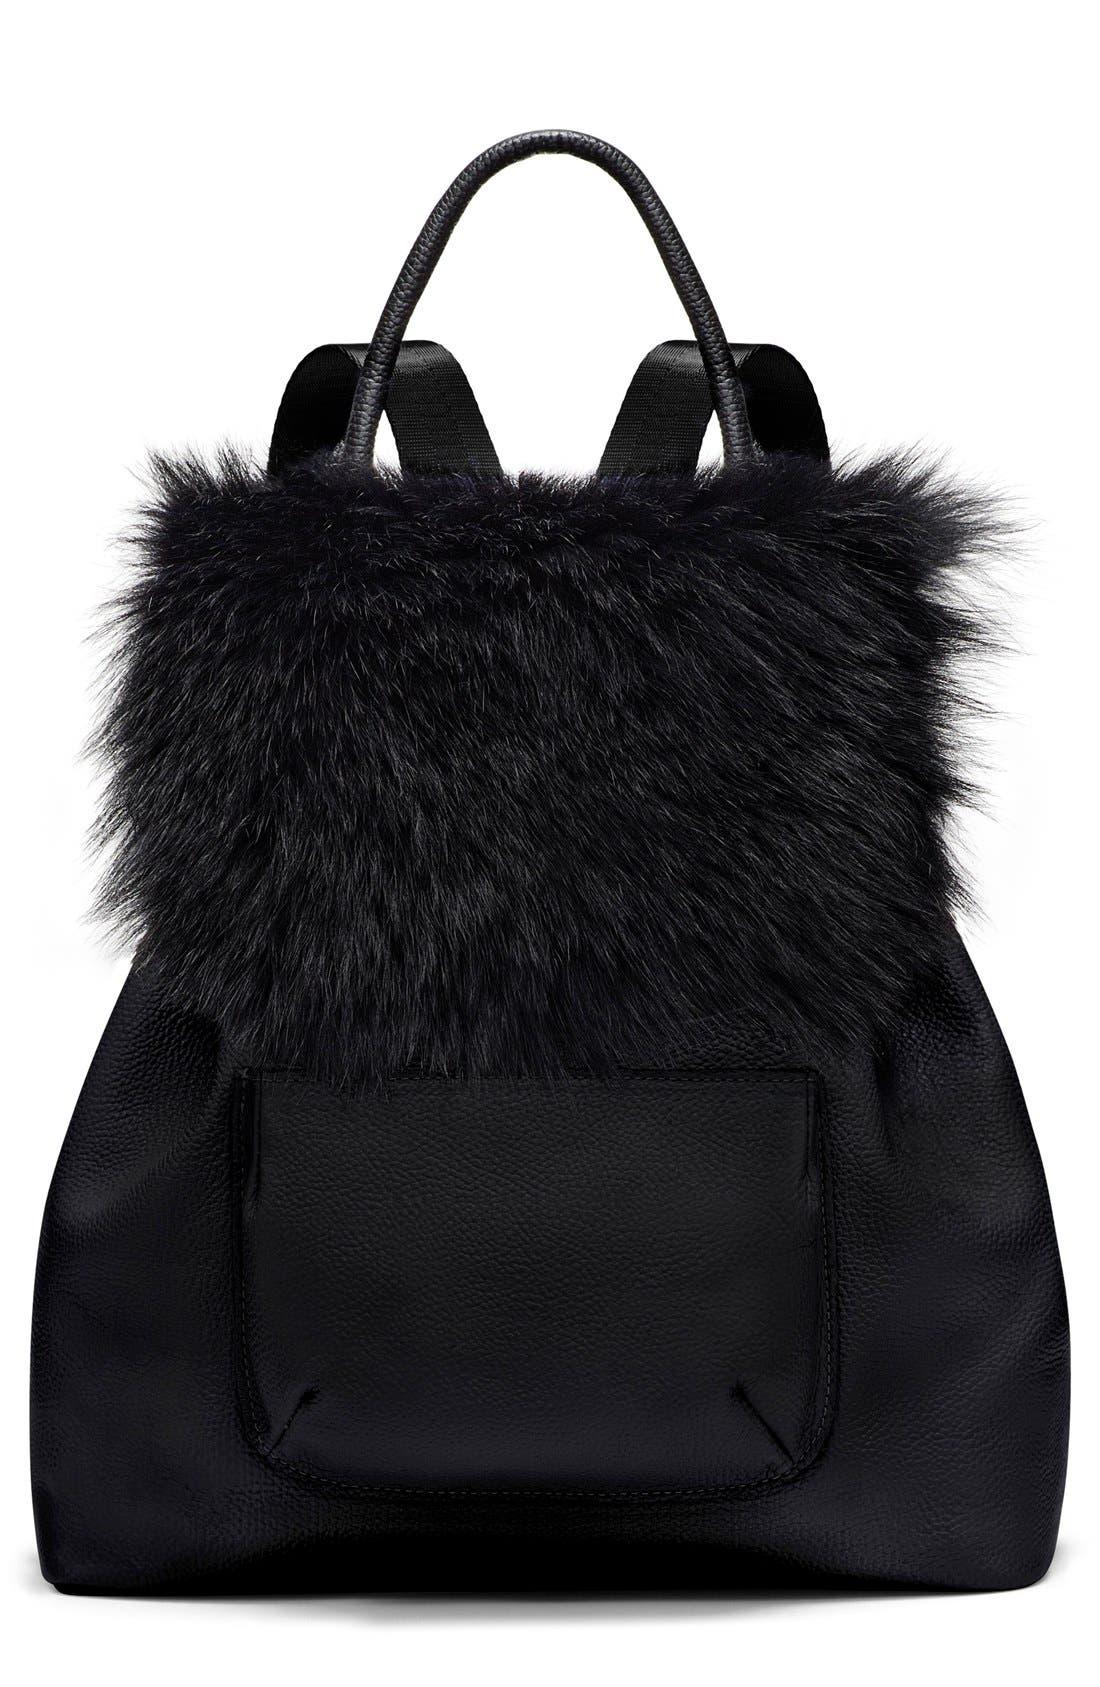 Main Image - Elizabeth and James 'Langley' Leather & Genuine Sheep Fur Backpack